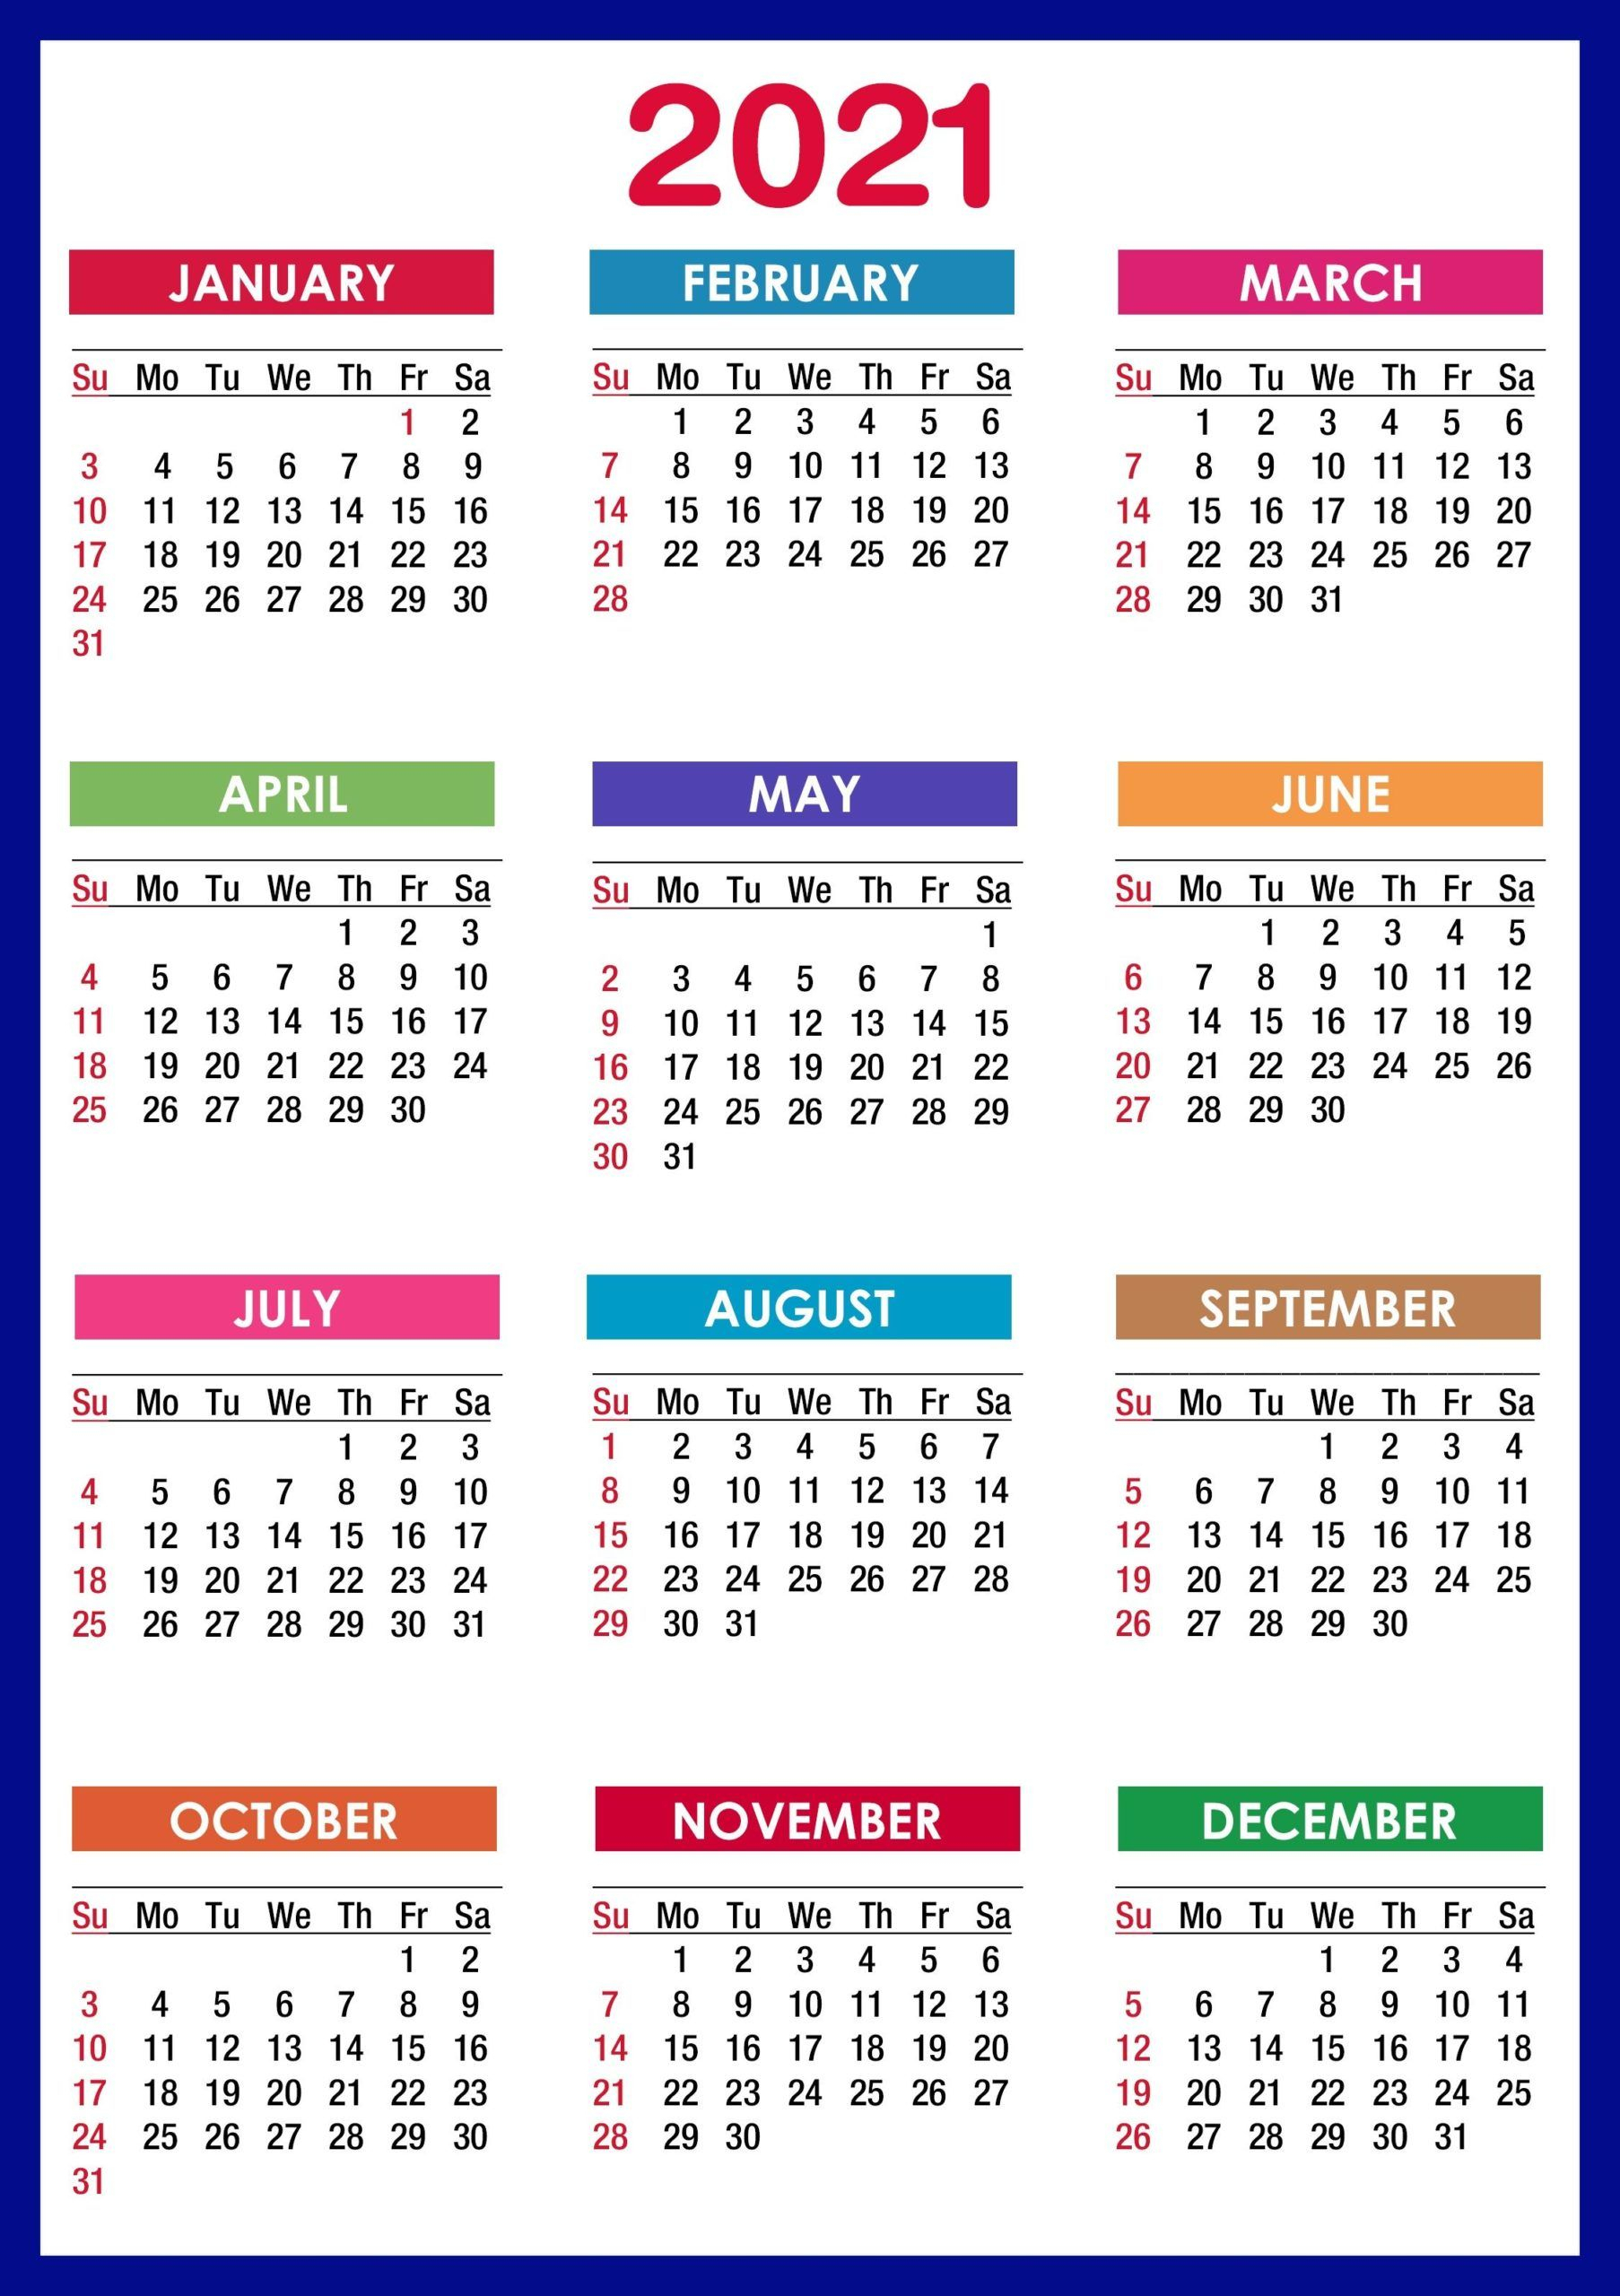 Sunday To Saturday Calendar 2021 Printable | Calendar ...